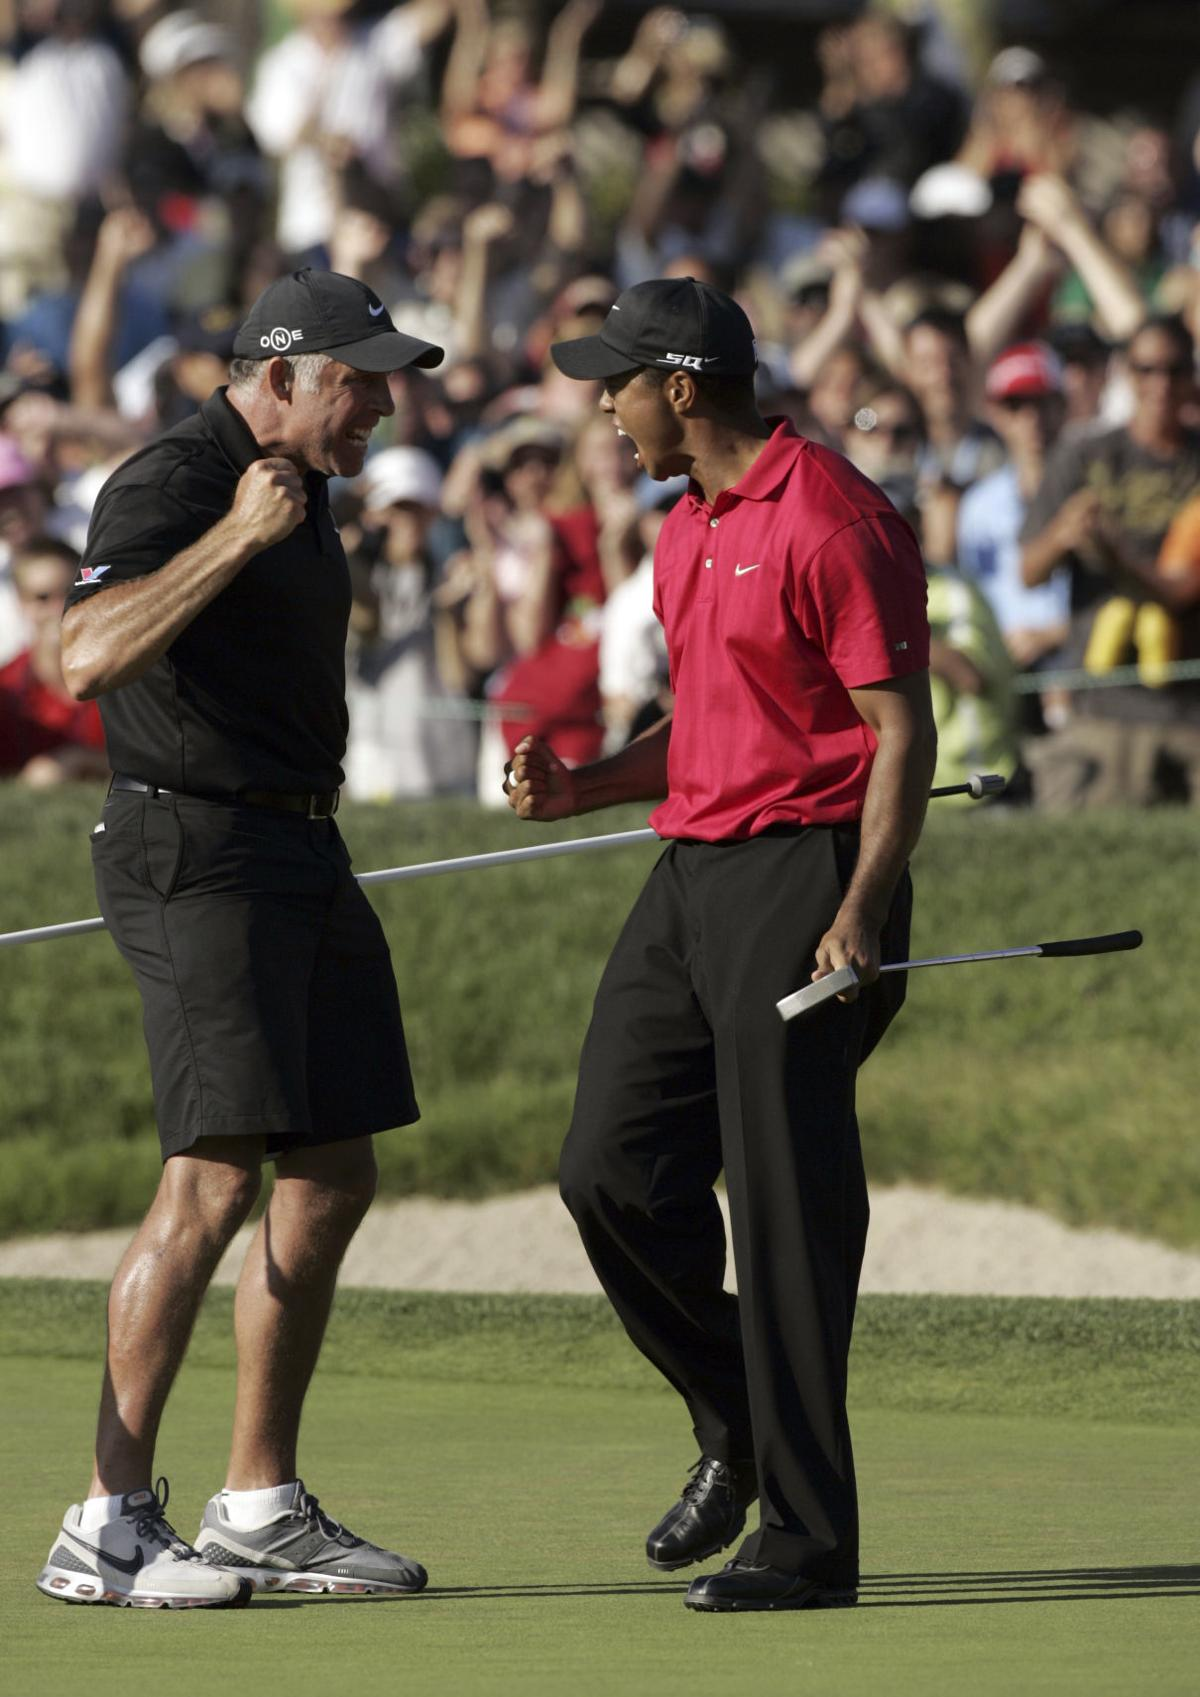 US Open Tigers Last Major Golf